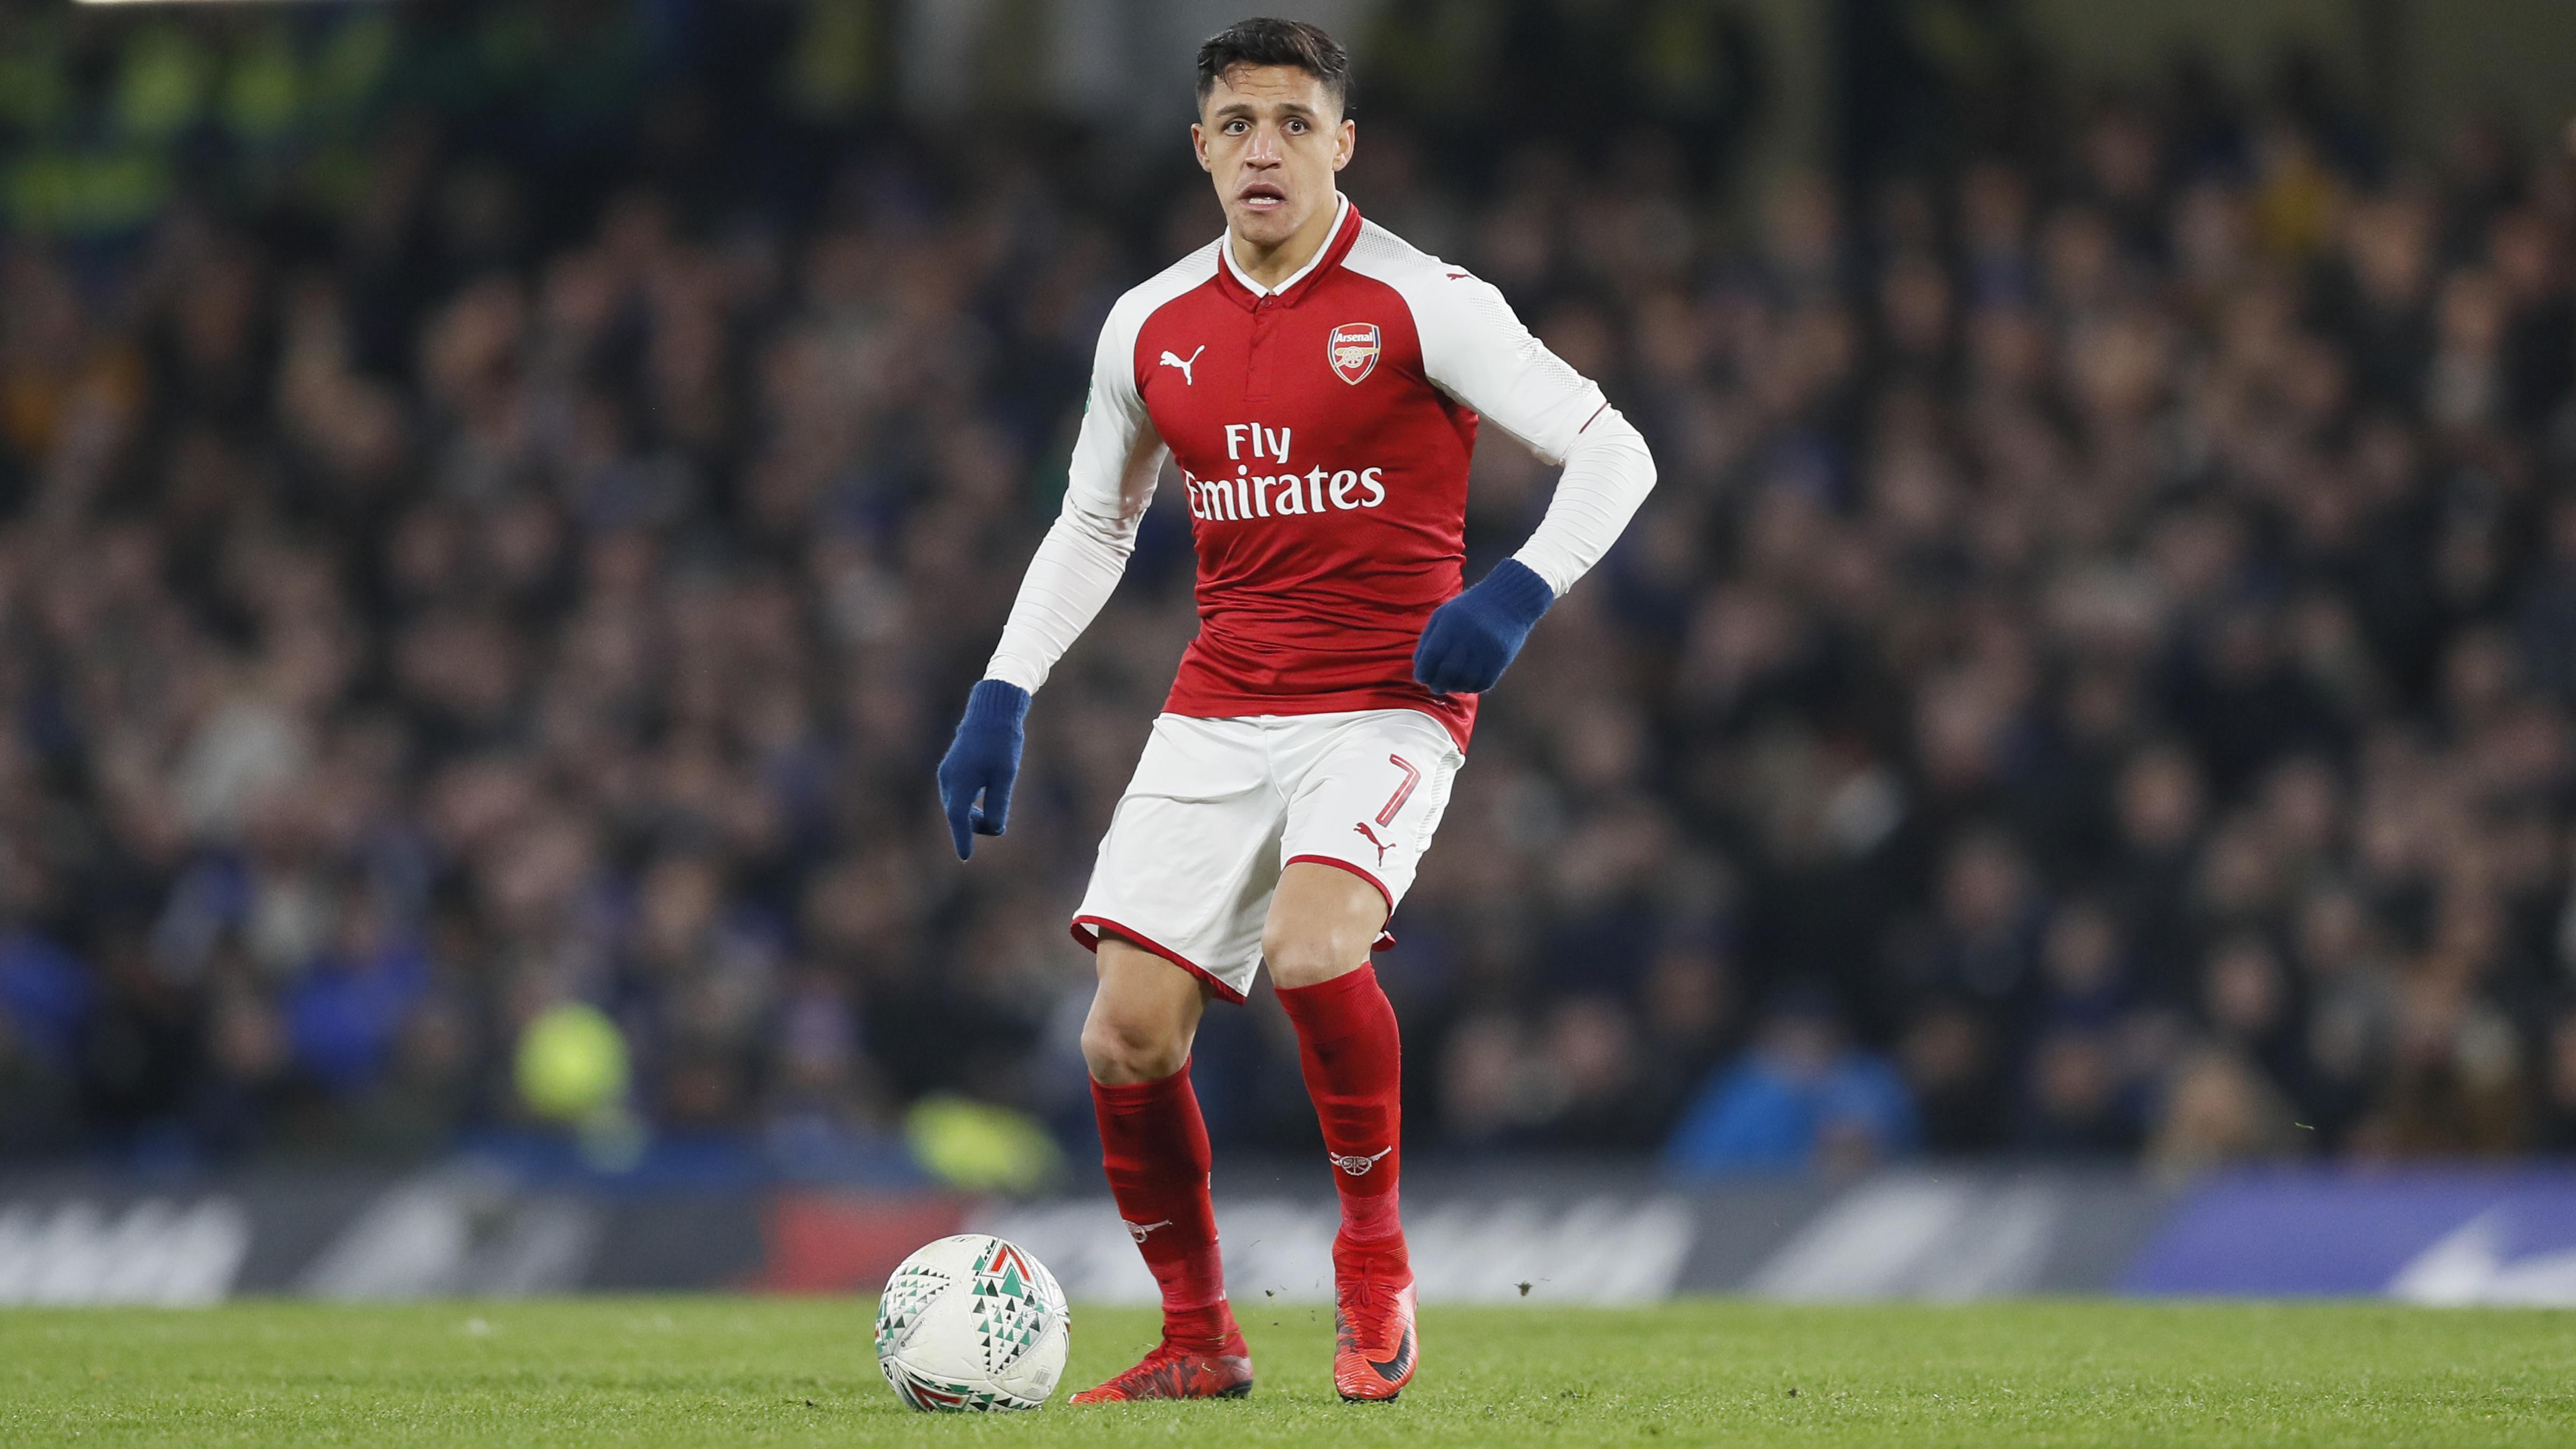 Alexis Sanchez has reportedly said goodbye to his Arsenal team-mates